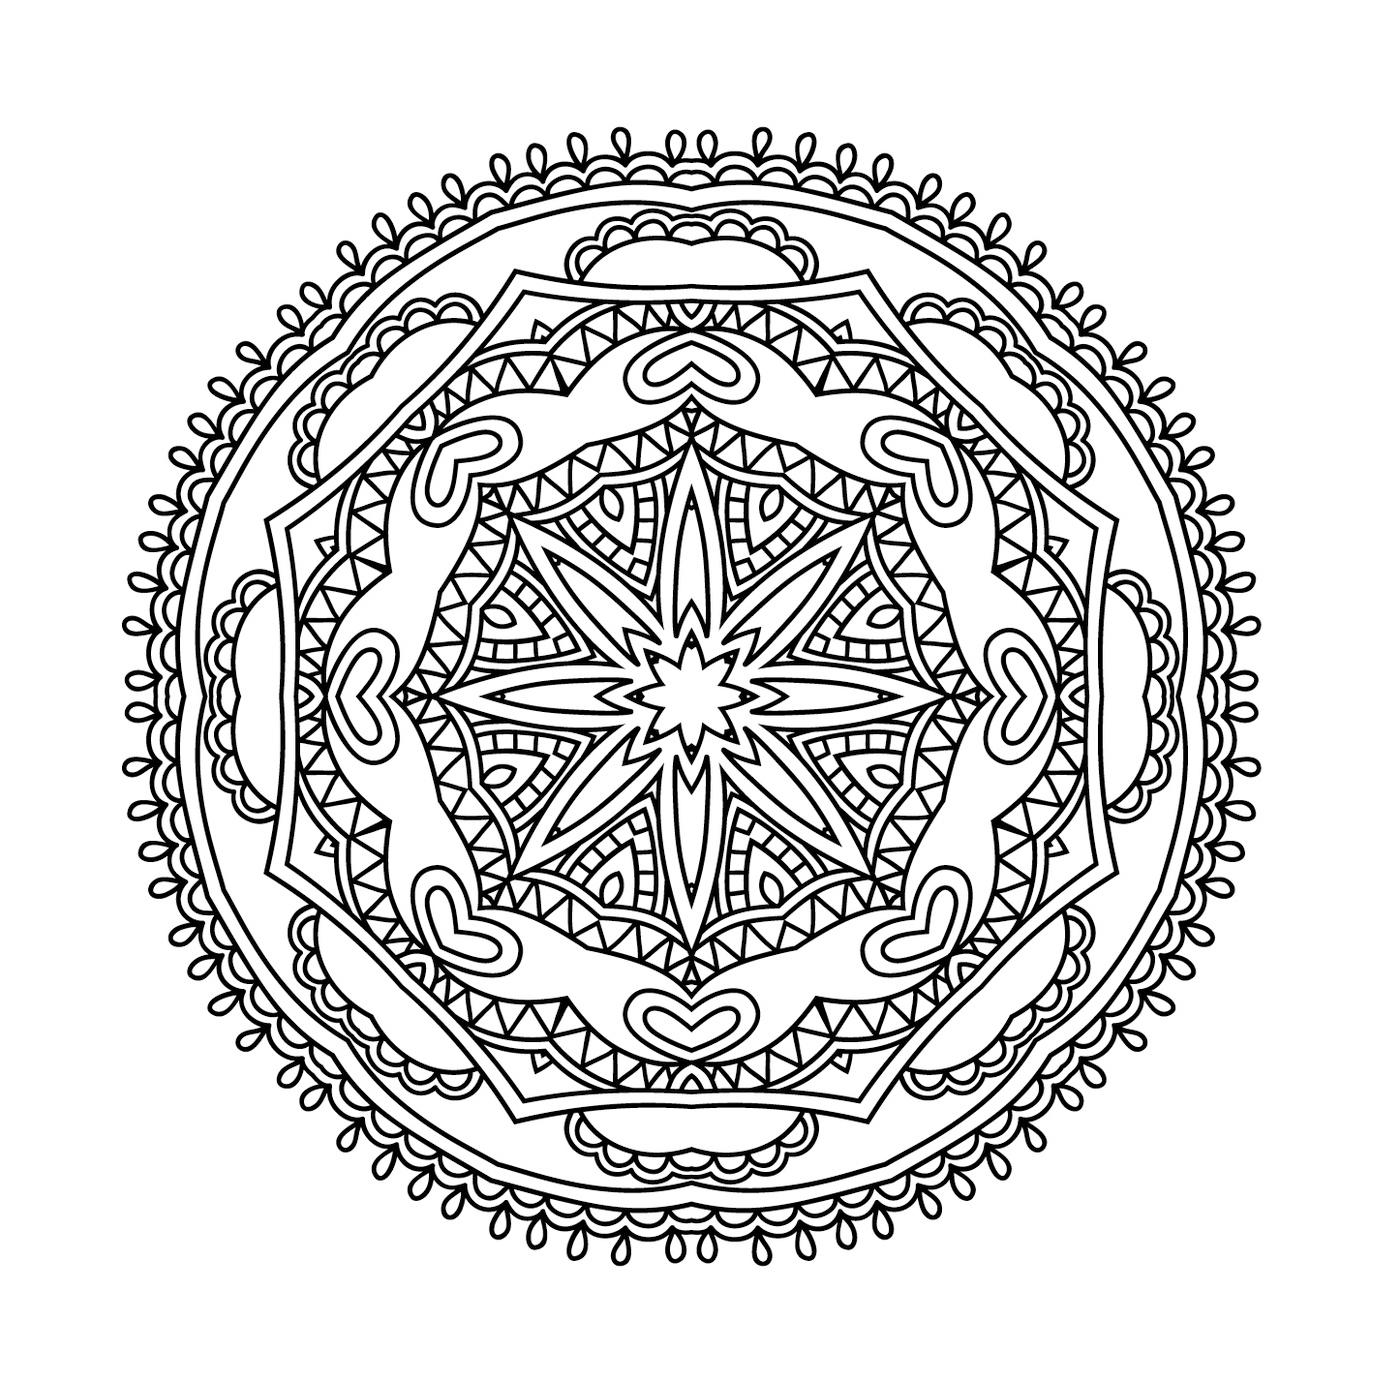 Mandala, Coloriage Mandala En Ligne avec Coloriage De Mandala Difficile A Imprimer